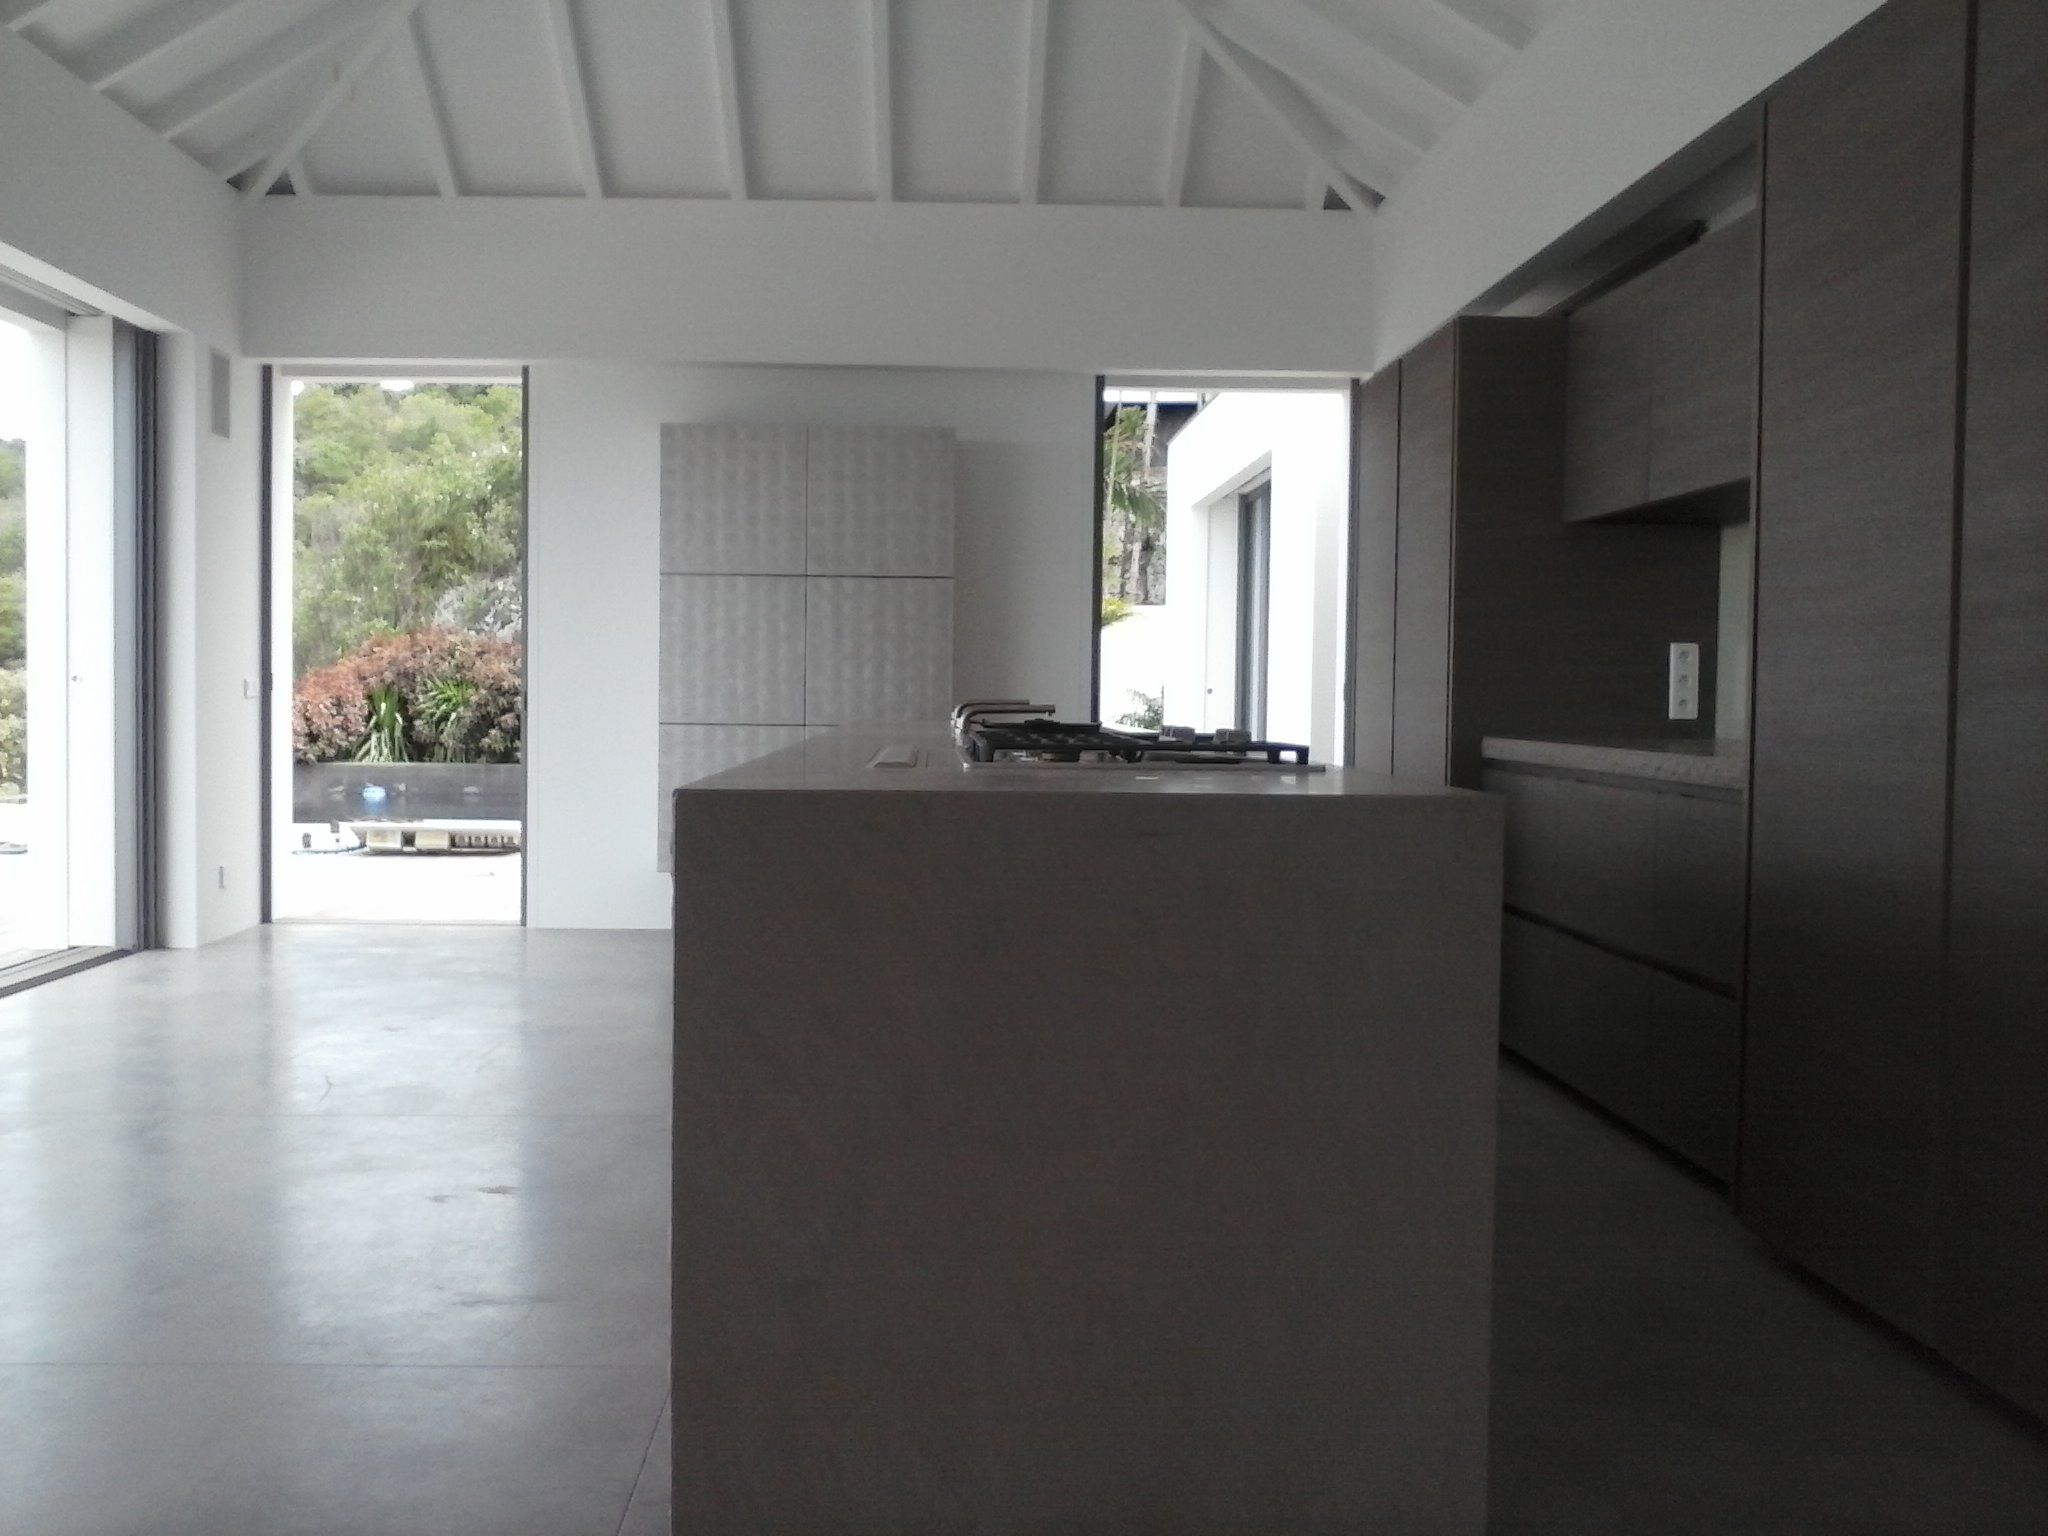 Minotti Cucine White Lacquered Gandhara kitchen with White ...